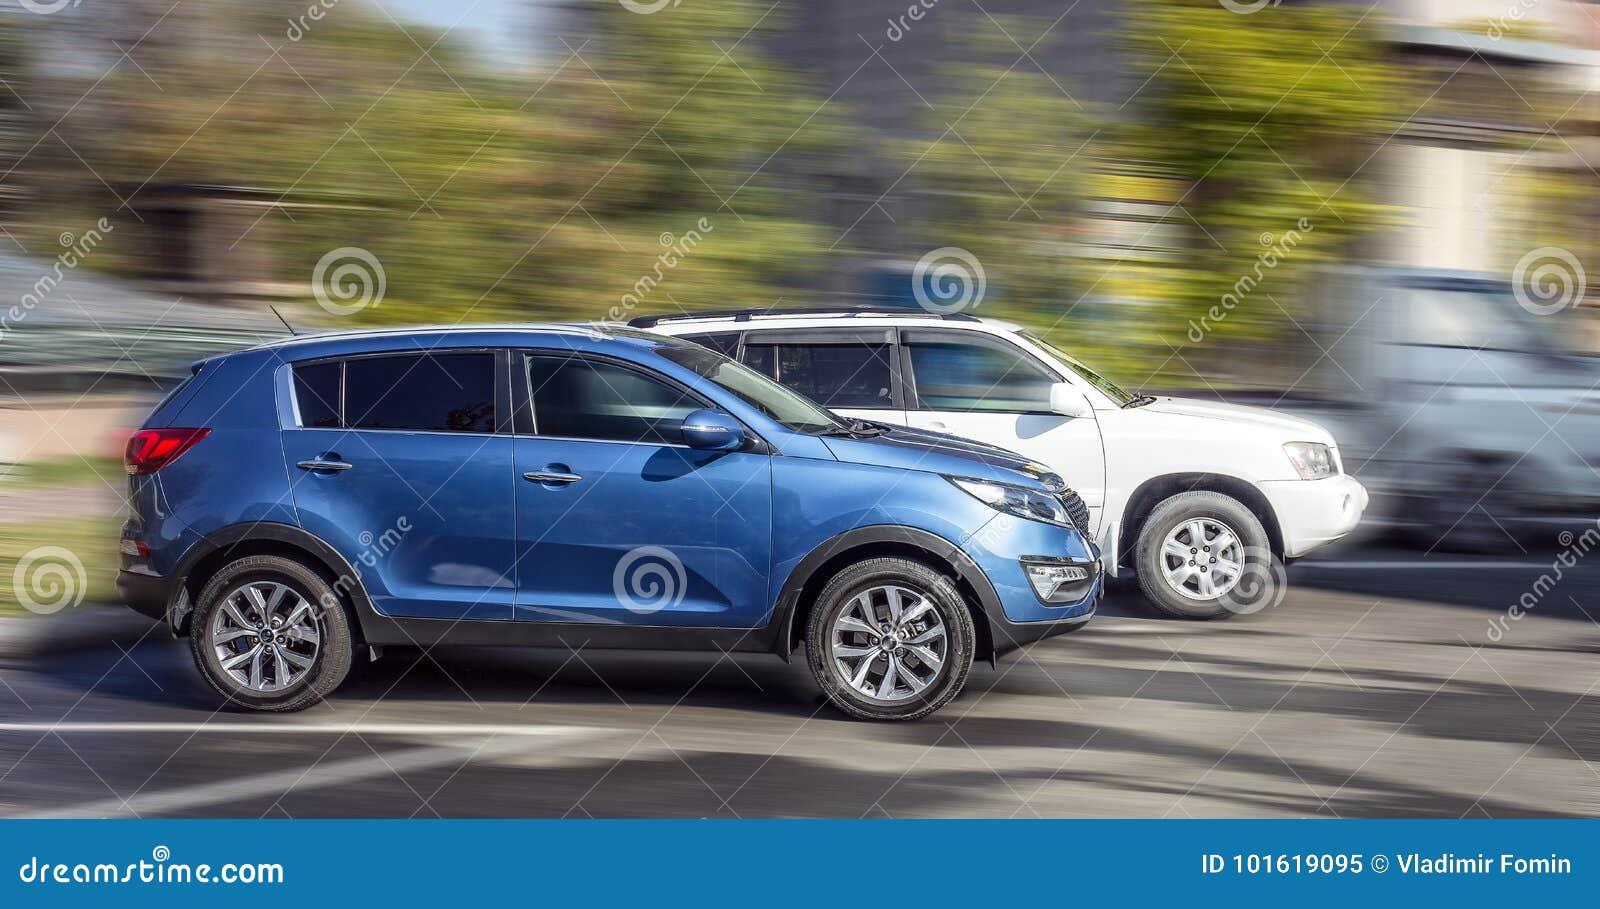 kia blue car stock image image of white large small 101619095